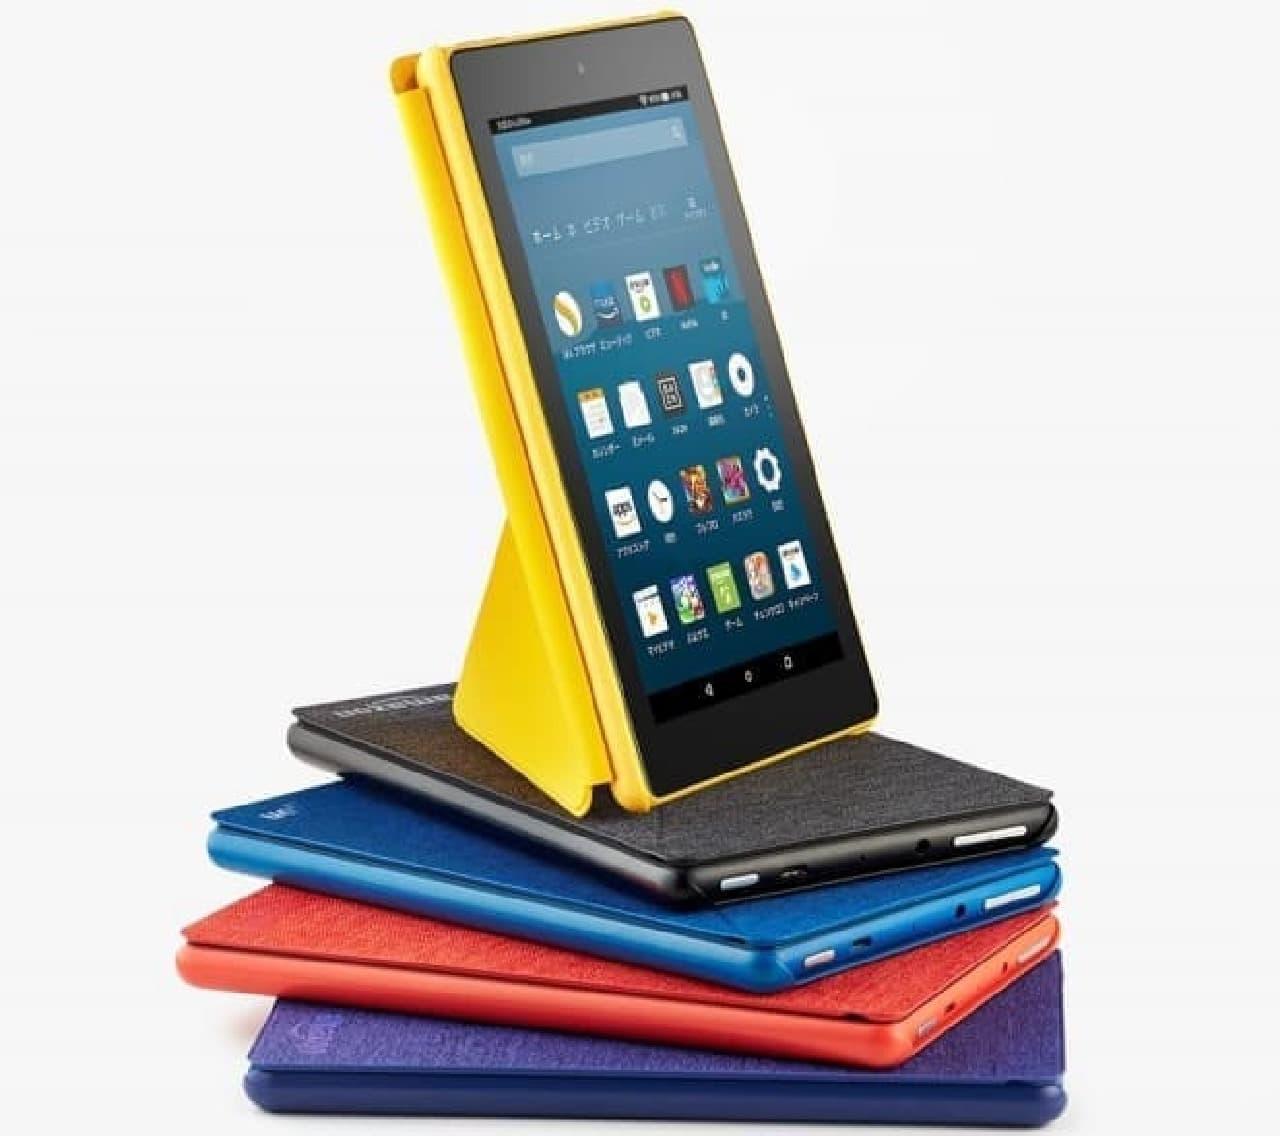 Amazon、新世代のFireタブレット 2機種「Amazon Fire 7」と「Amazon Fire HD 8」を発売